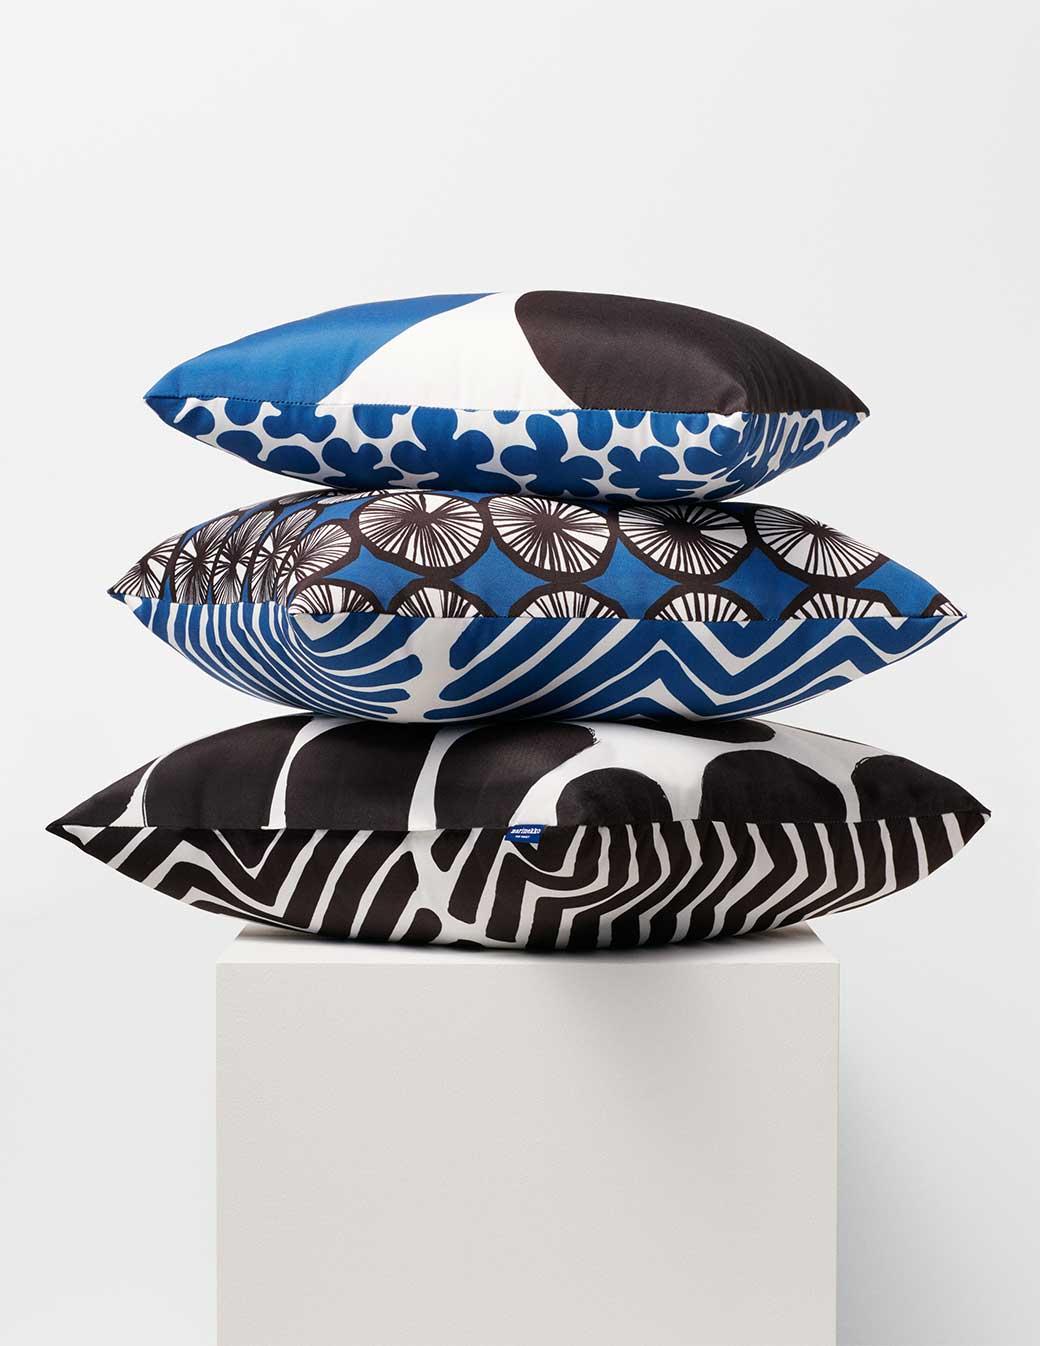 Marimekko for Target bold patterned pillows via @thouswellblog